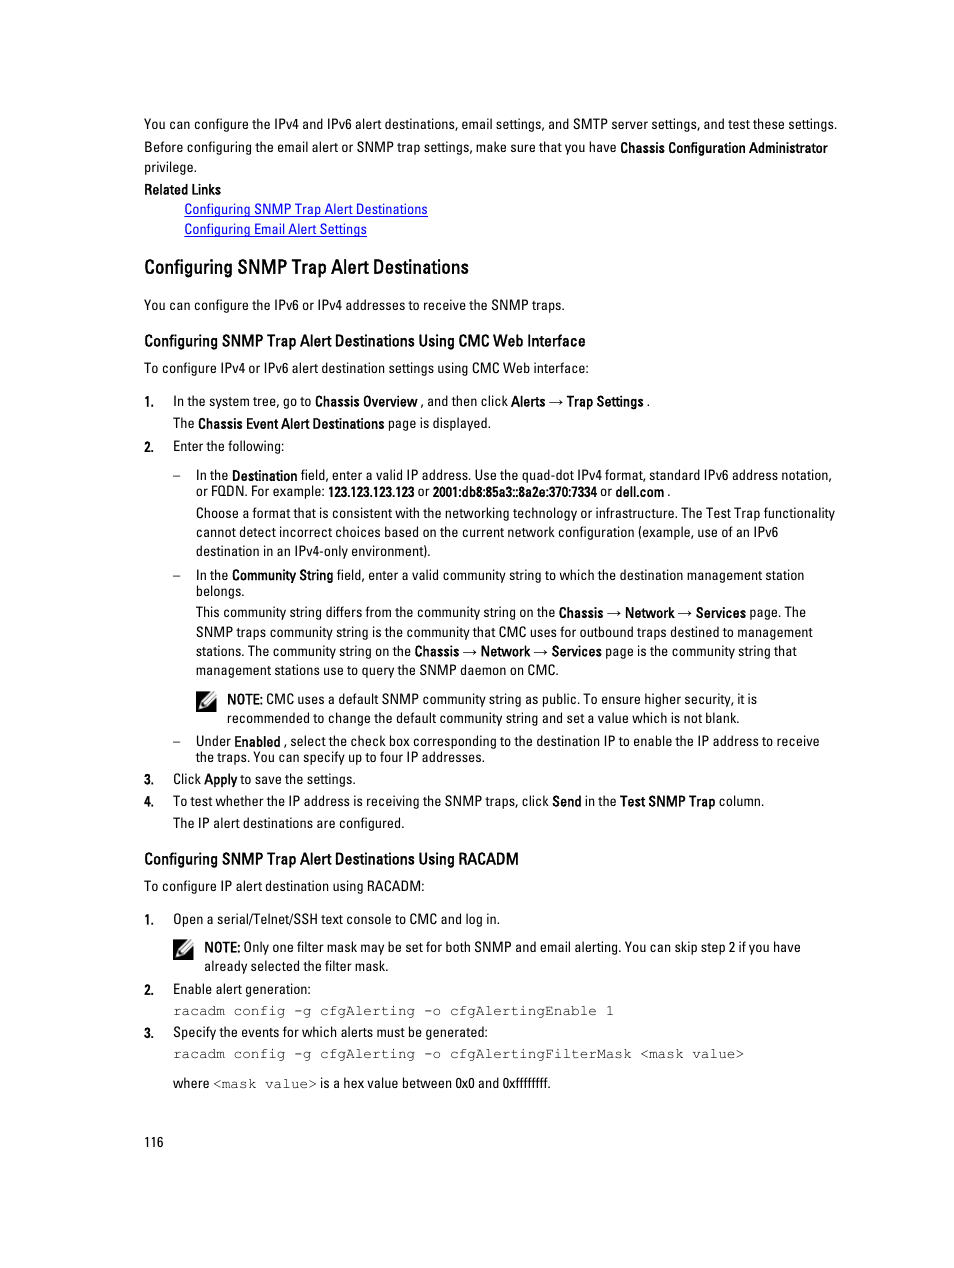 Configuring snmp trap alert destinations | Dell POWEREDGE